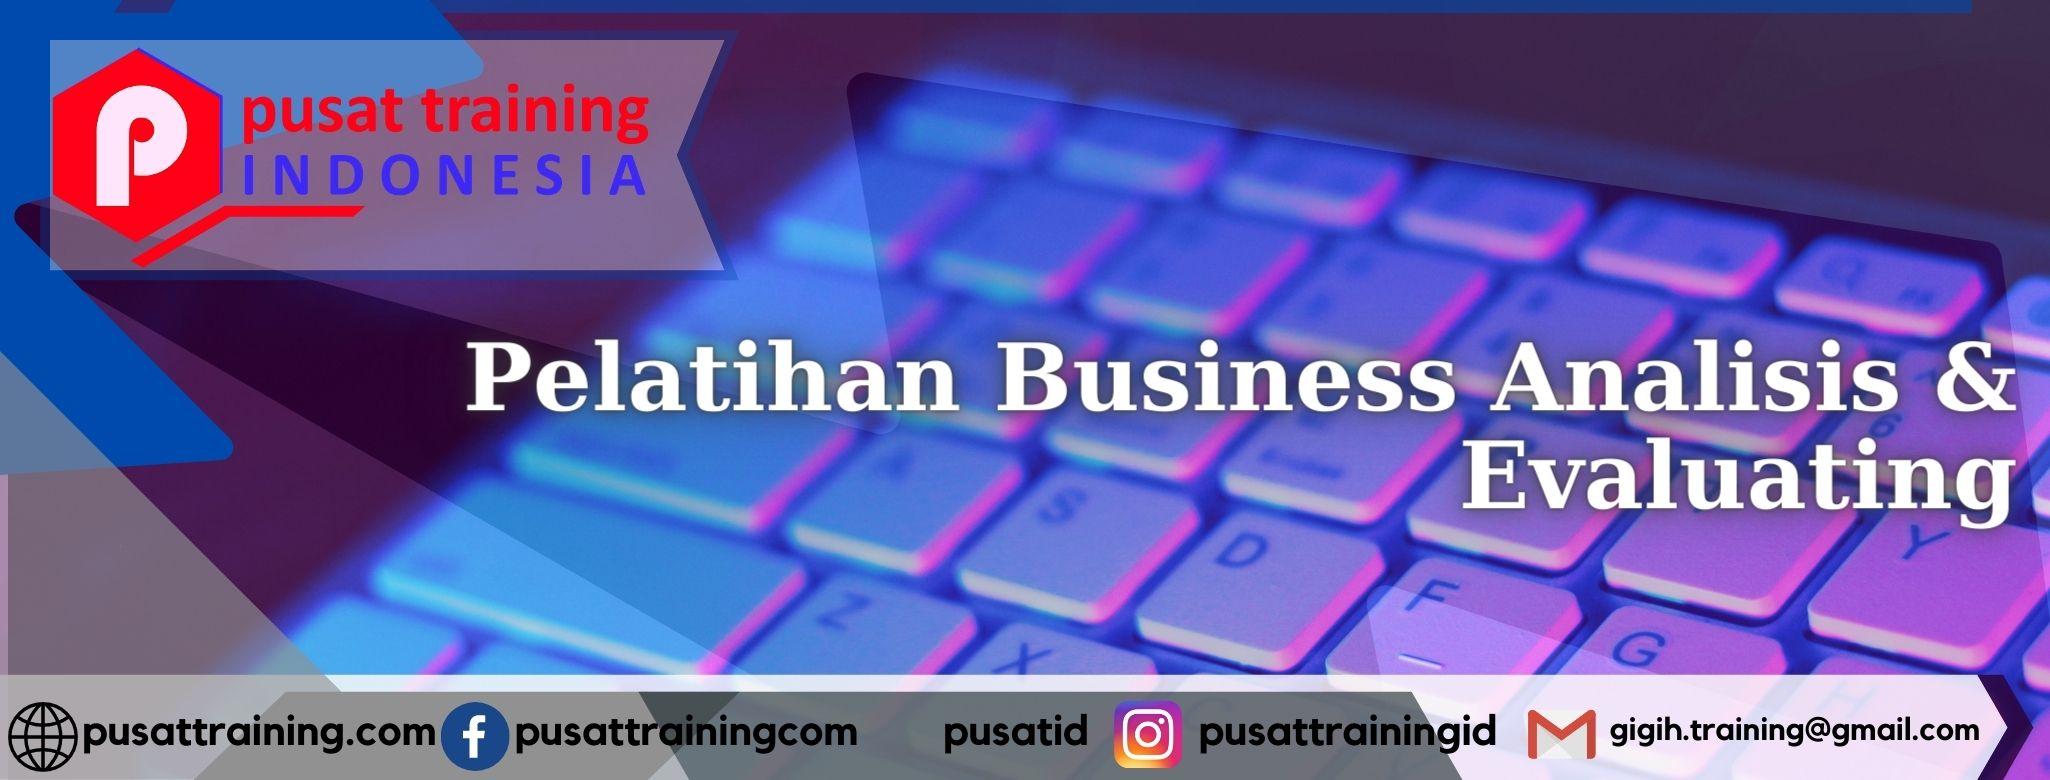 Pelatihan-Business-Analisis-Evaluating